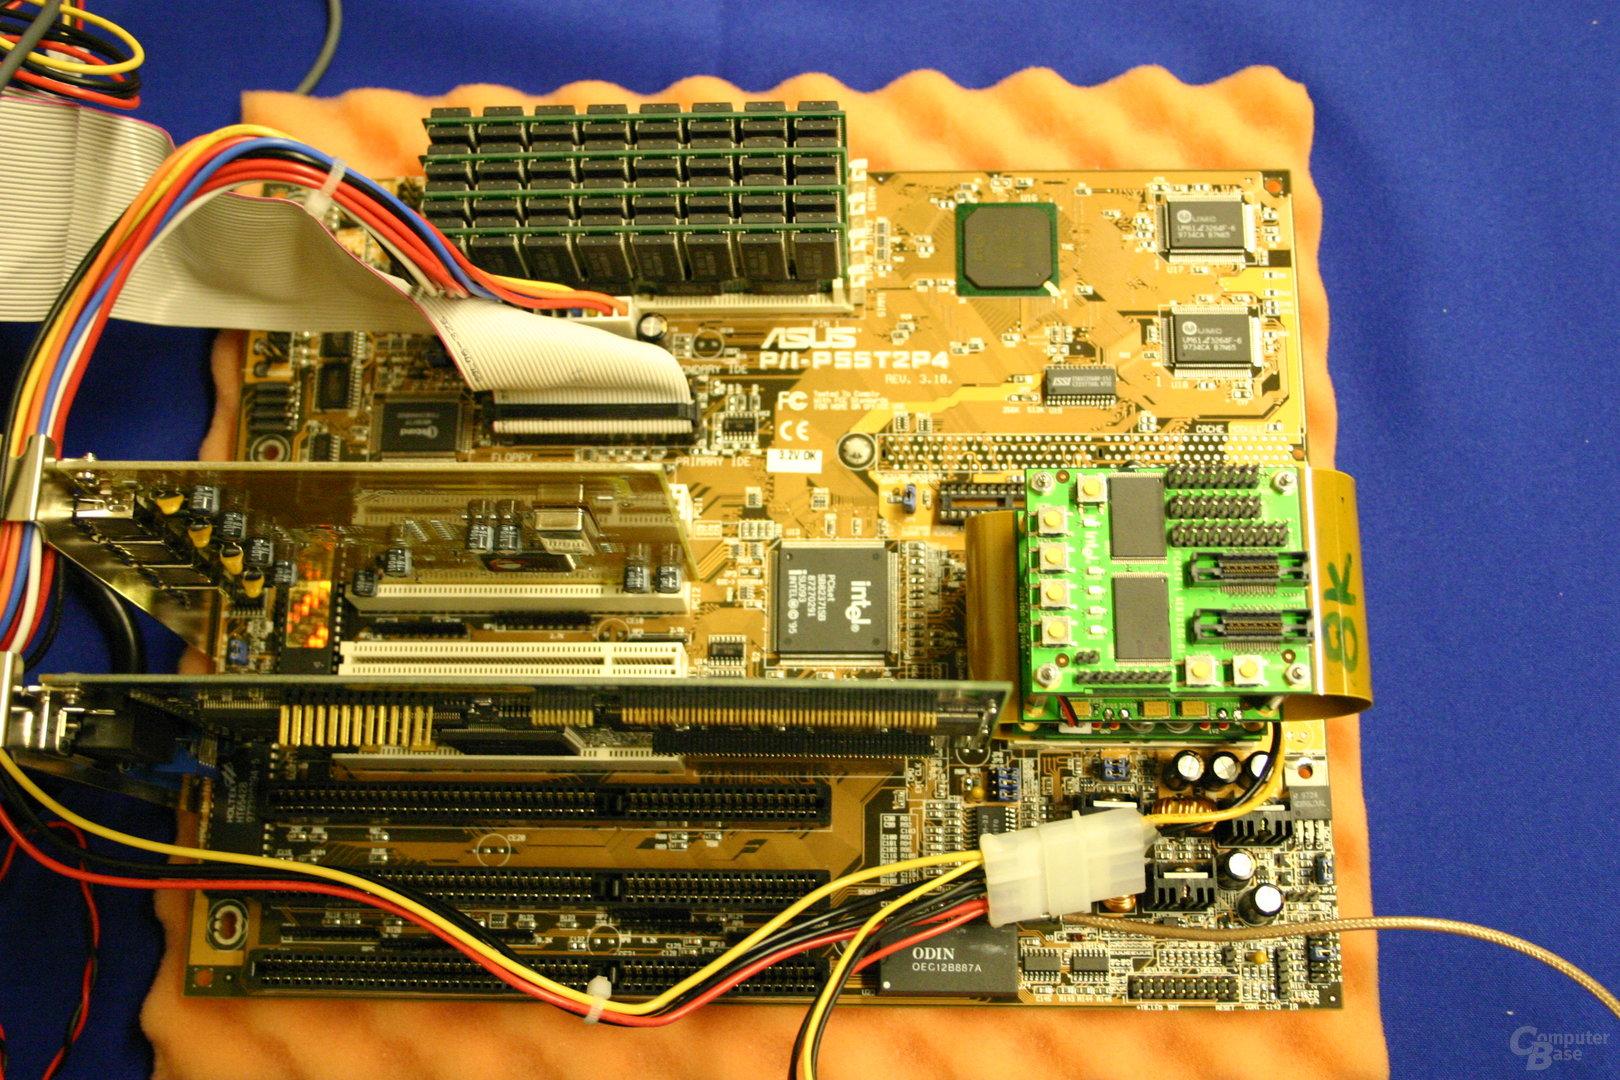 Tera-Scale-forschung in Braunschweig mittels FPGAs